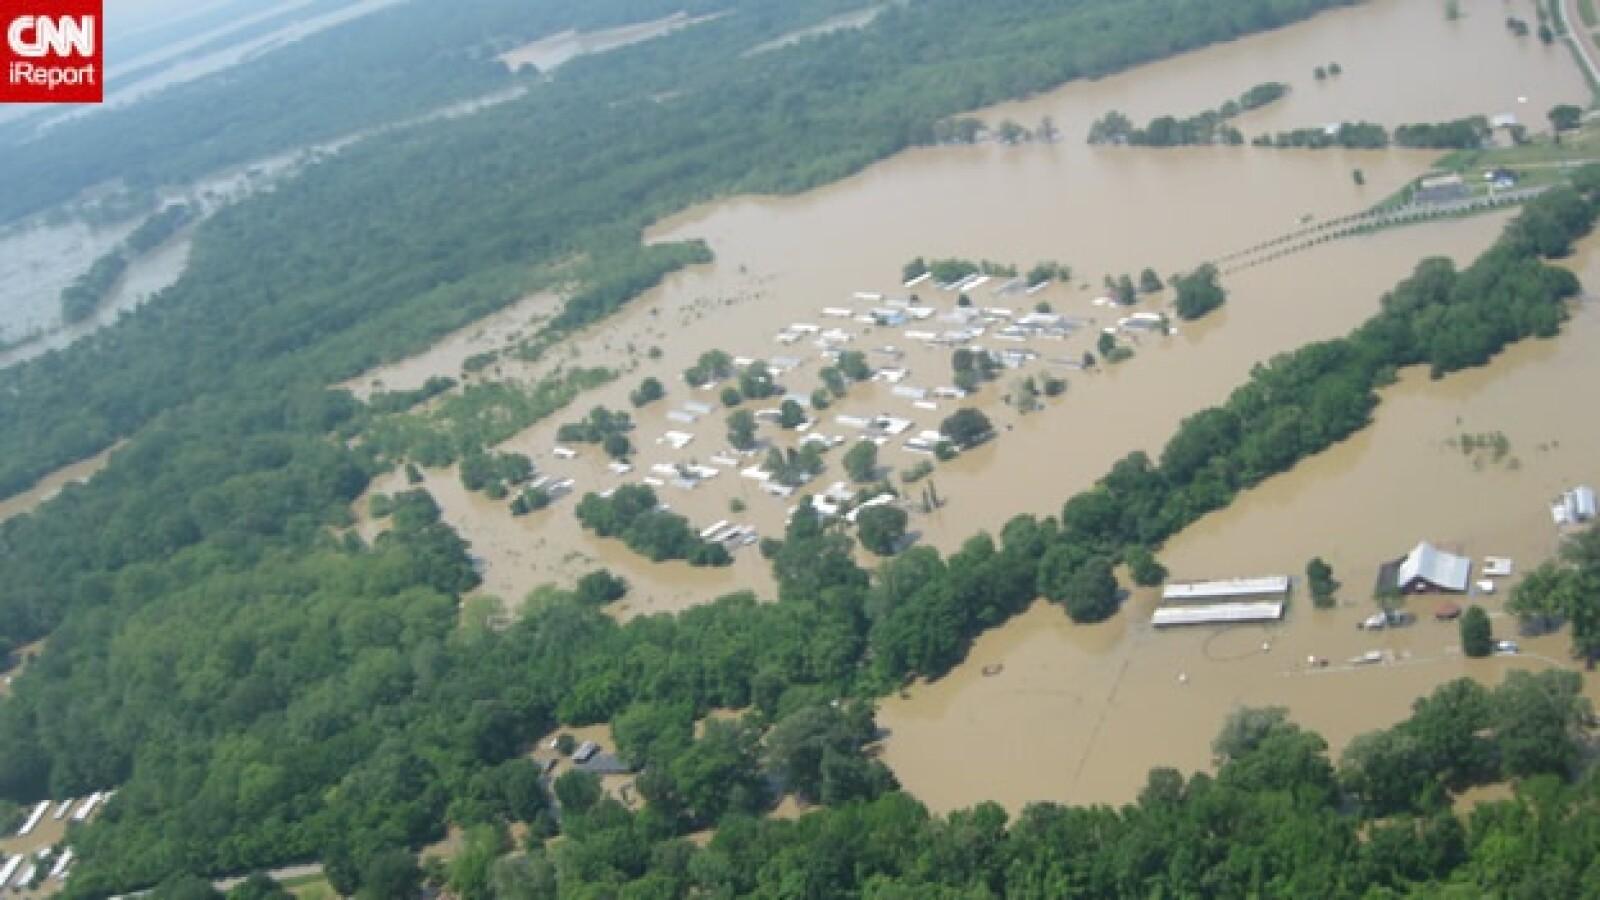 irpt-inundacionesEU6